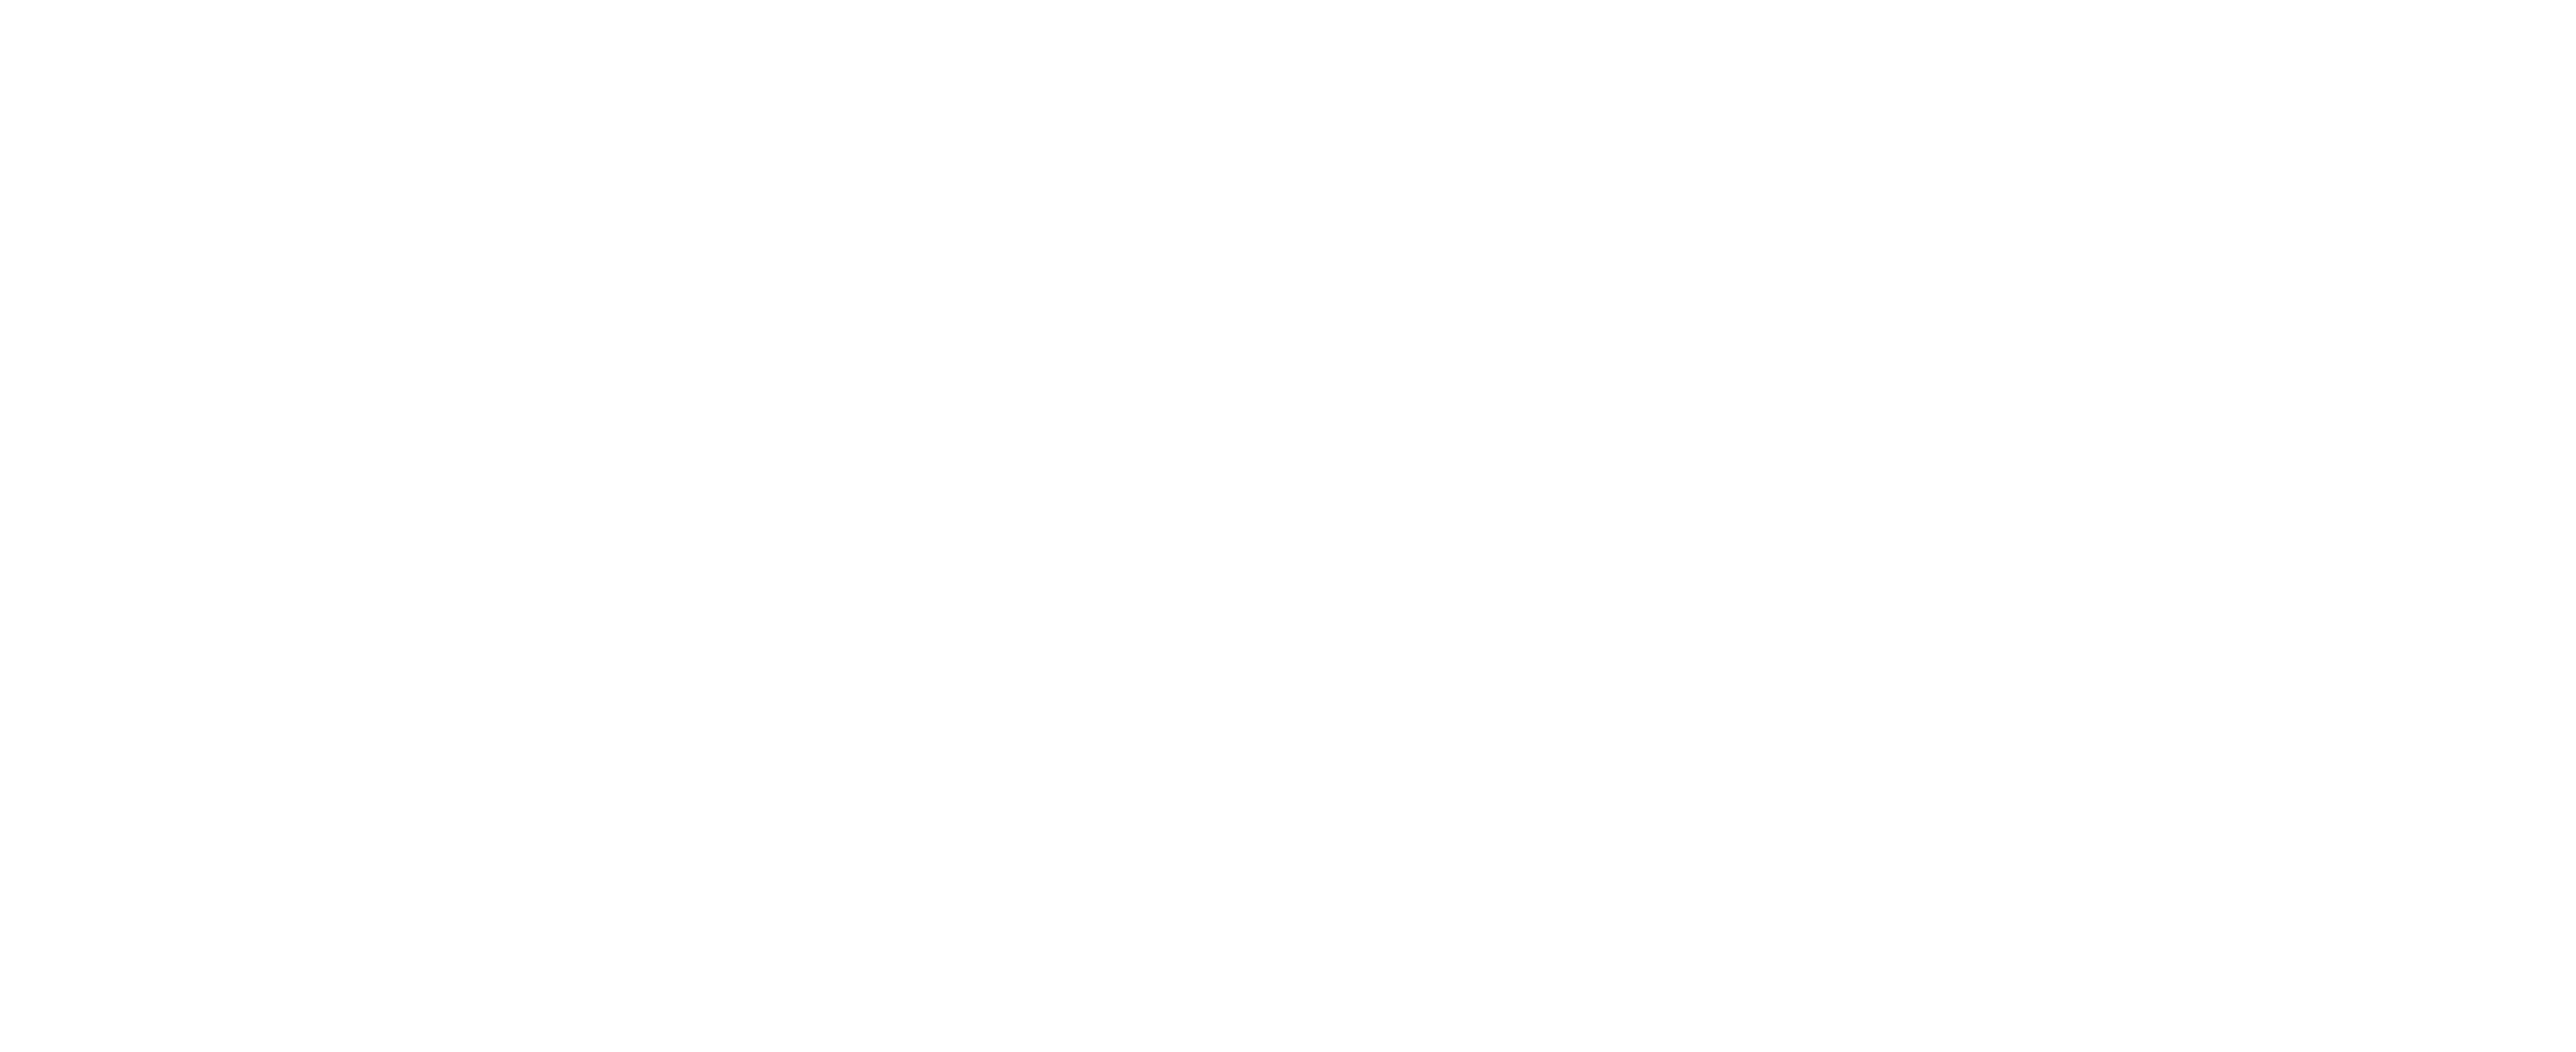 Crossing the Heart of Australia